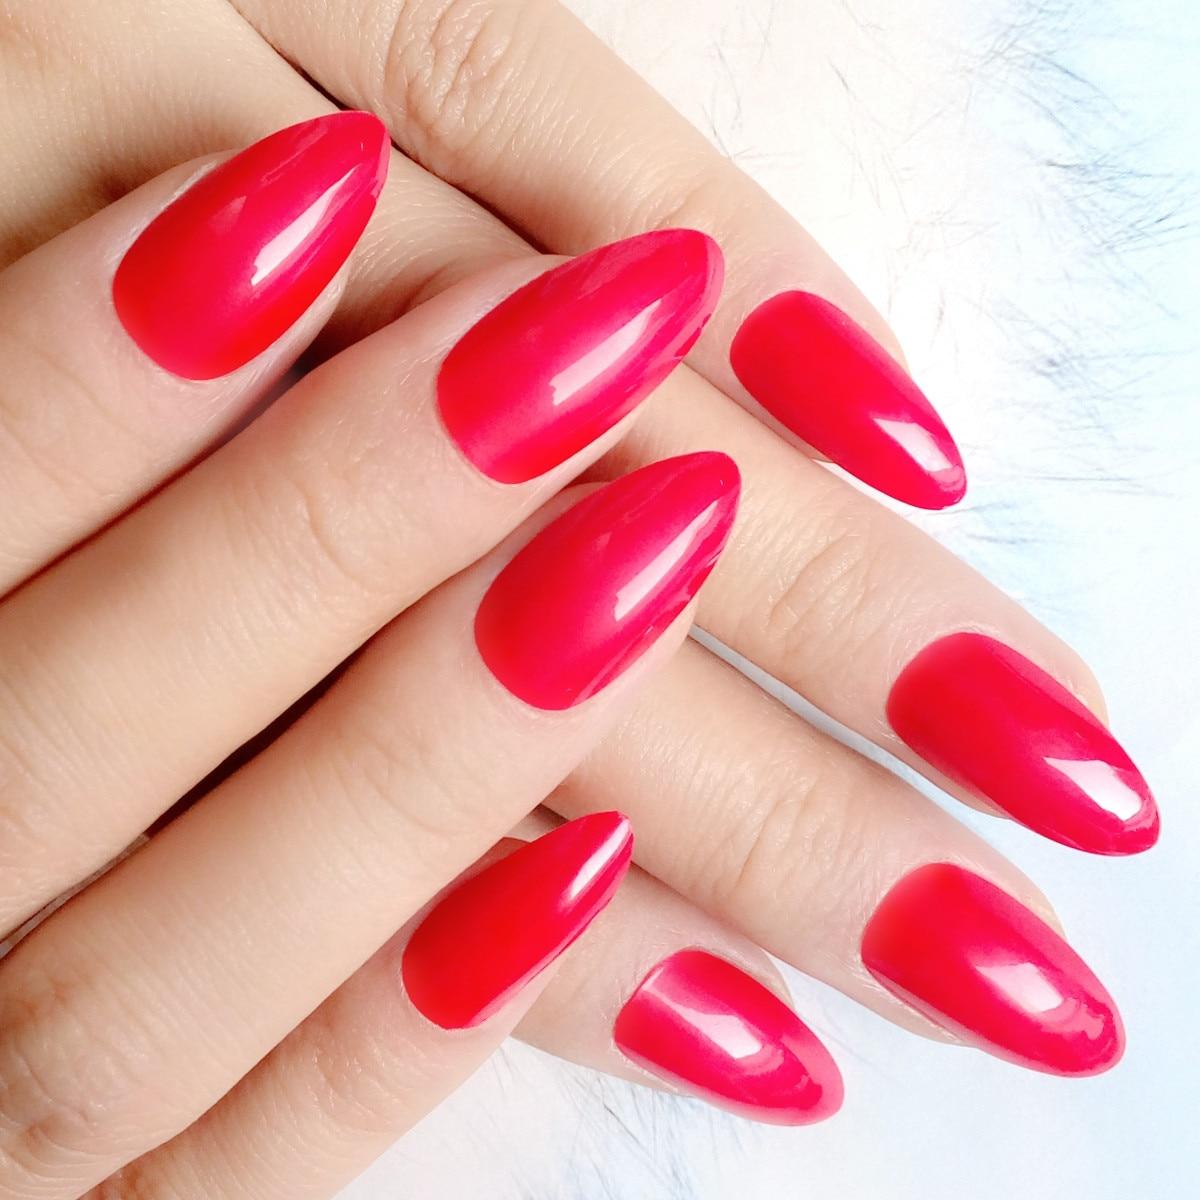 Candy Red False Nails Fashion Pointed Acrylic Fake Nails Short ...